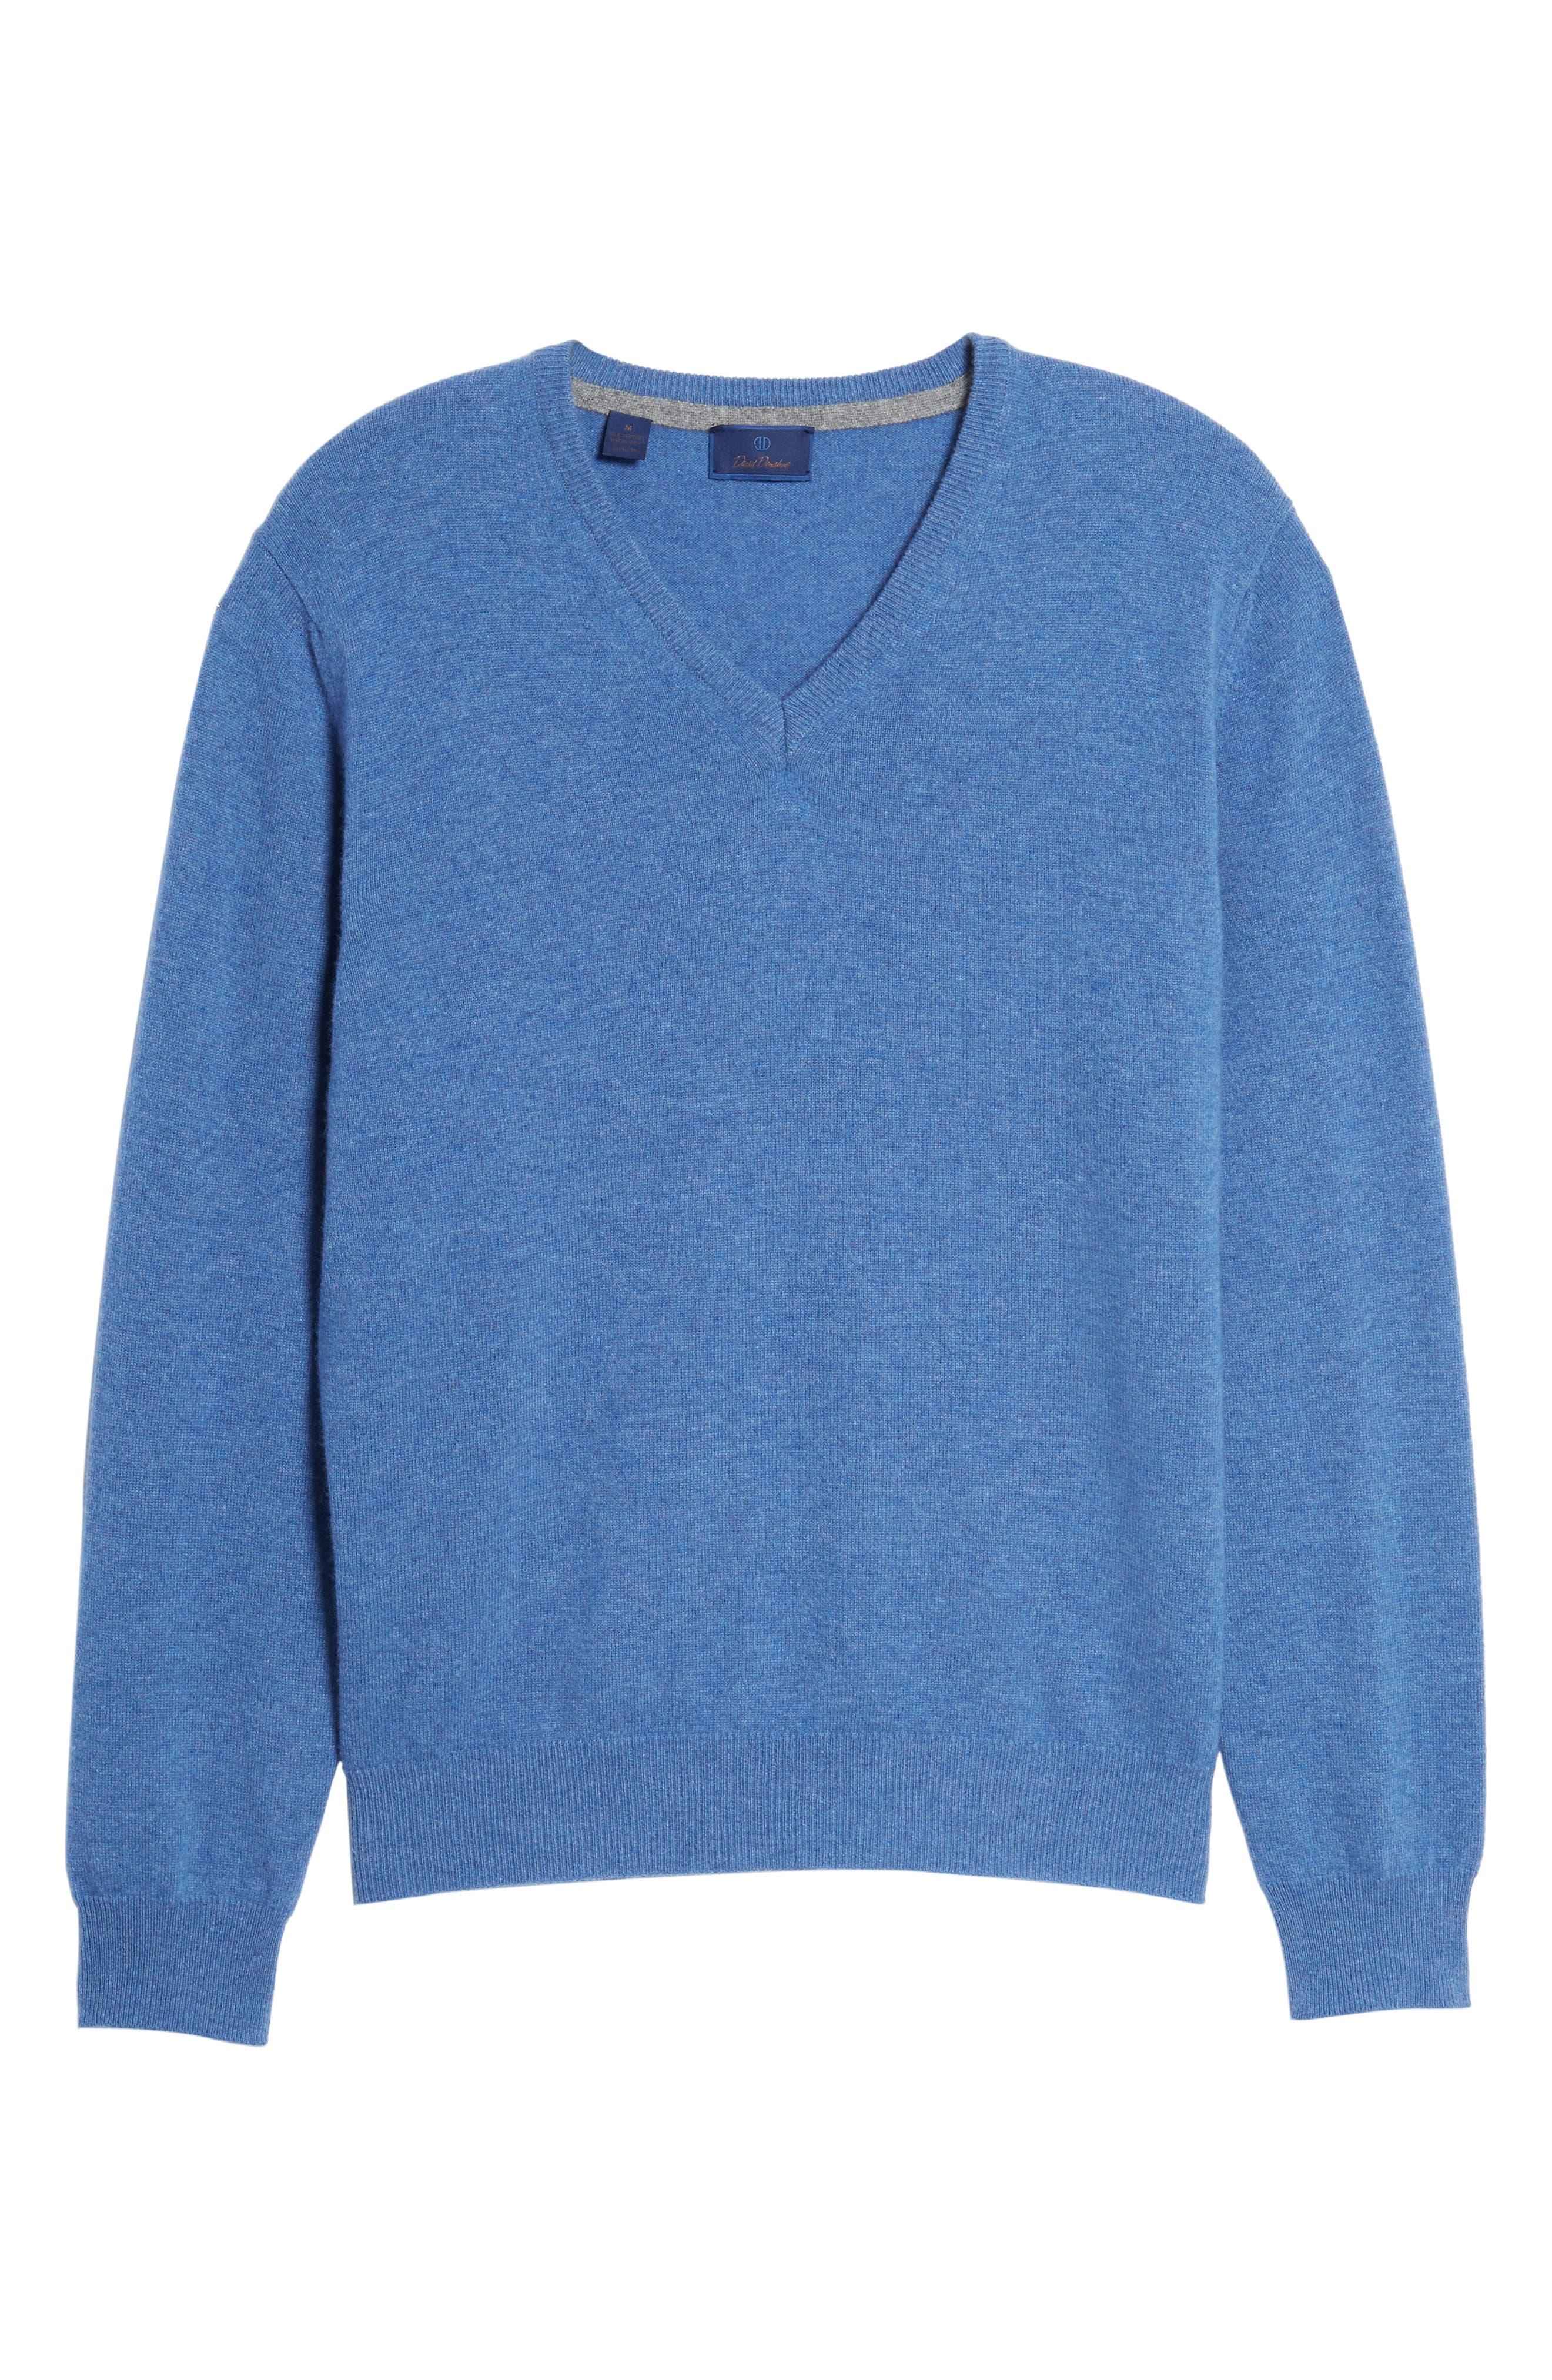 Cashmere V-Neck Sweater,                             Alternate thumbnail 34, color,